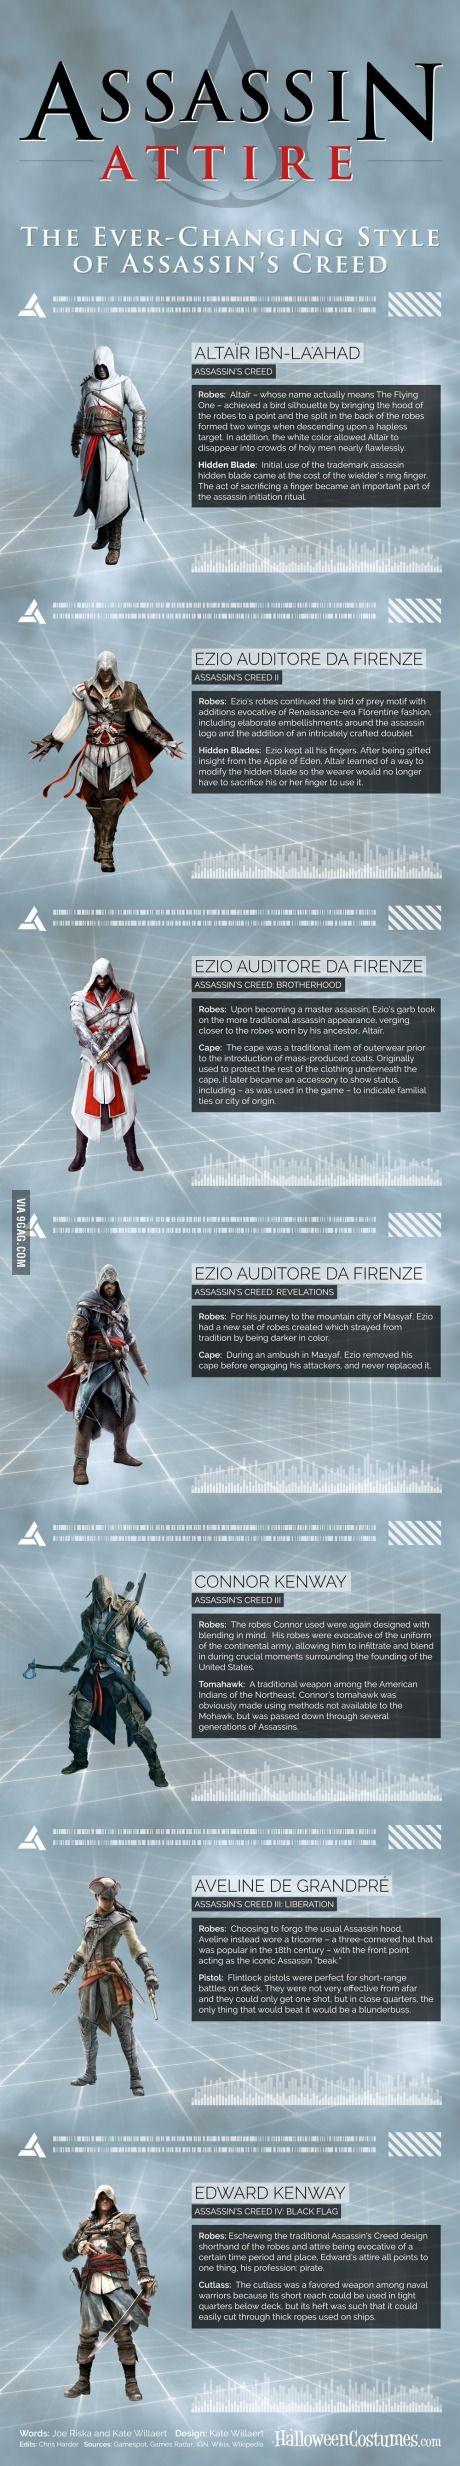 Assassin Attire - Assassin's Creed Infographic - http://geekstumbles.com/funny/assassin-attire-assassins-creed-infographic/